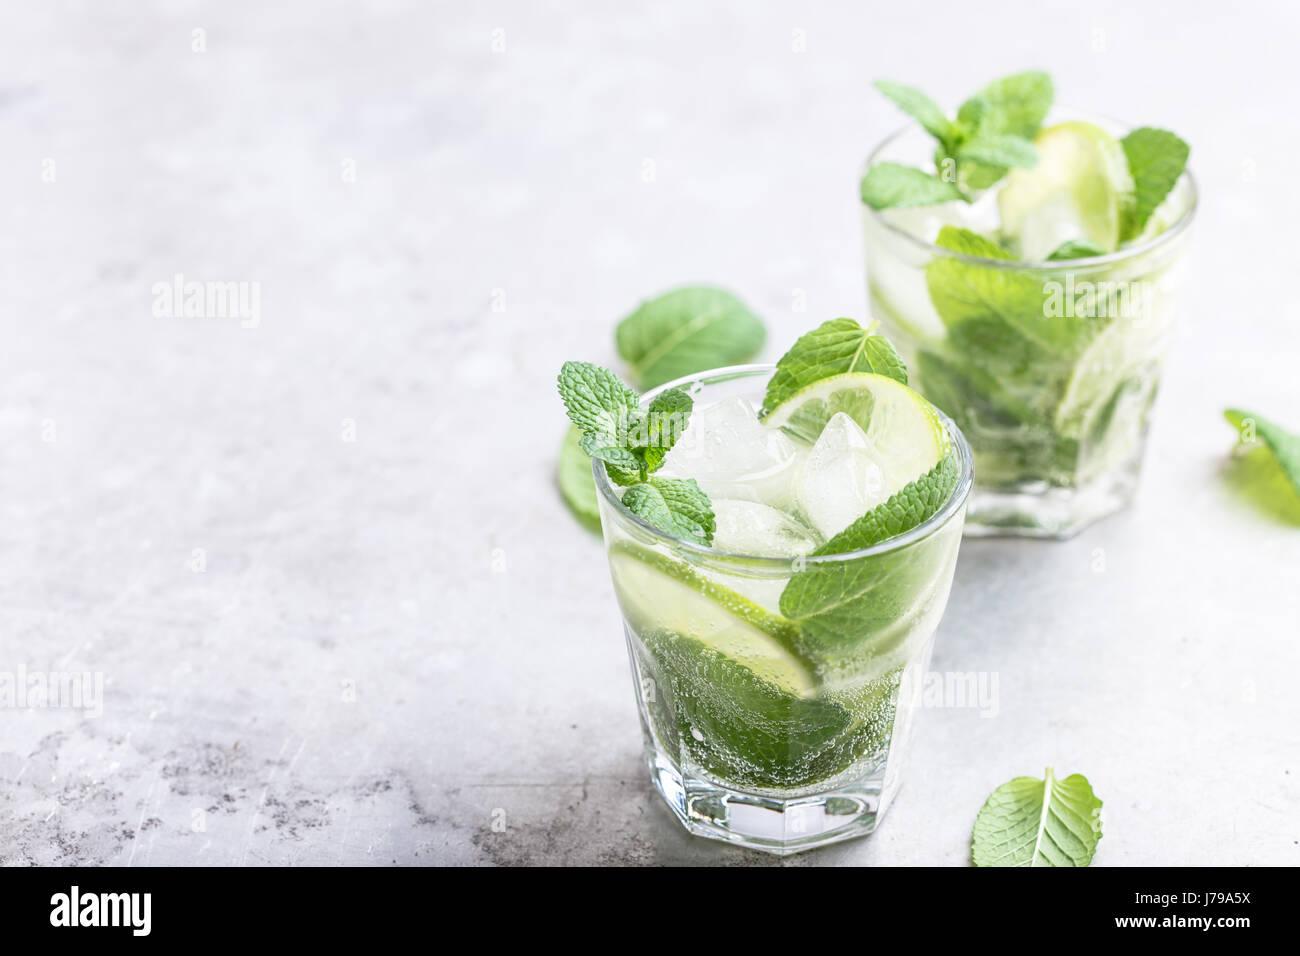 Cóctel Mojito sobre fondo gris claro de cerca, bebida refrescante de verano Foto de stock